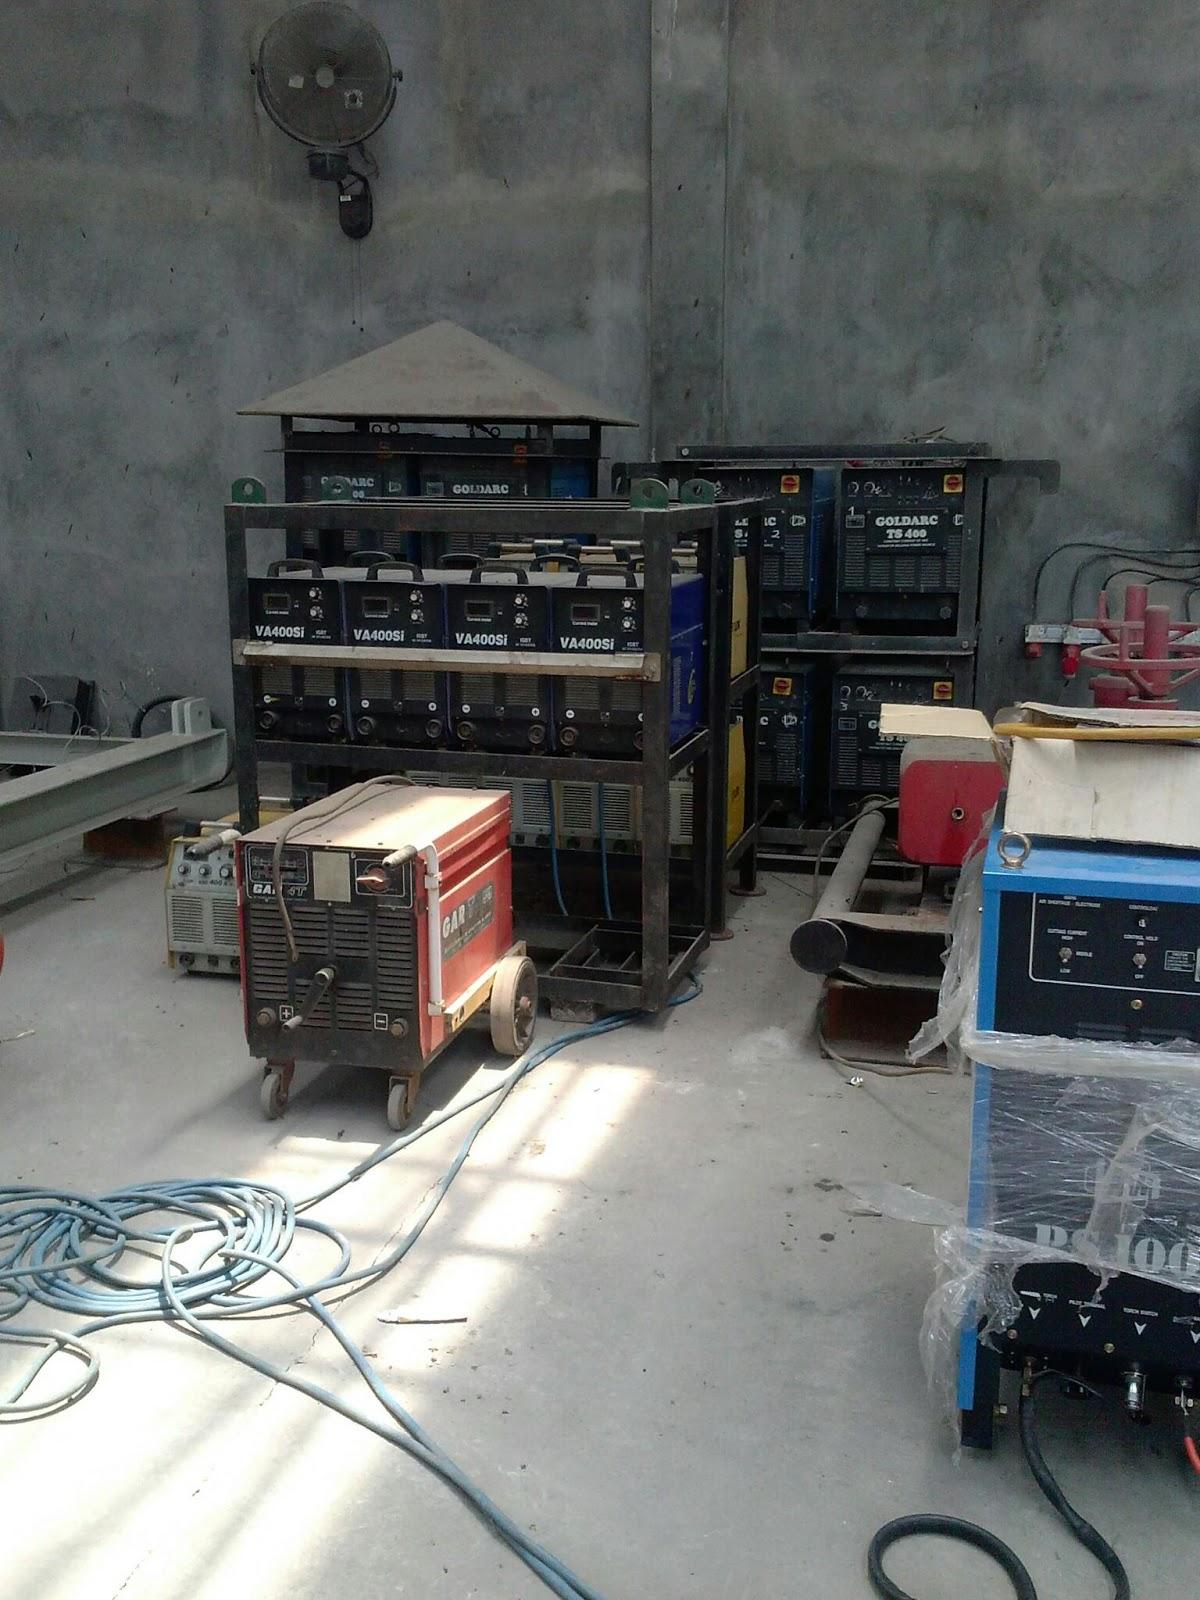 Cara memperbaiki mesin las kerusakan pada mesin las jalan tipar cakung kelurahan sukapura kecamatan cilincing jakarta utara 14140 hp 0815 1183 1883 0812 1881 8822 asfbconference2016 Gallery